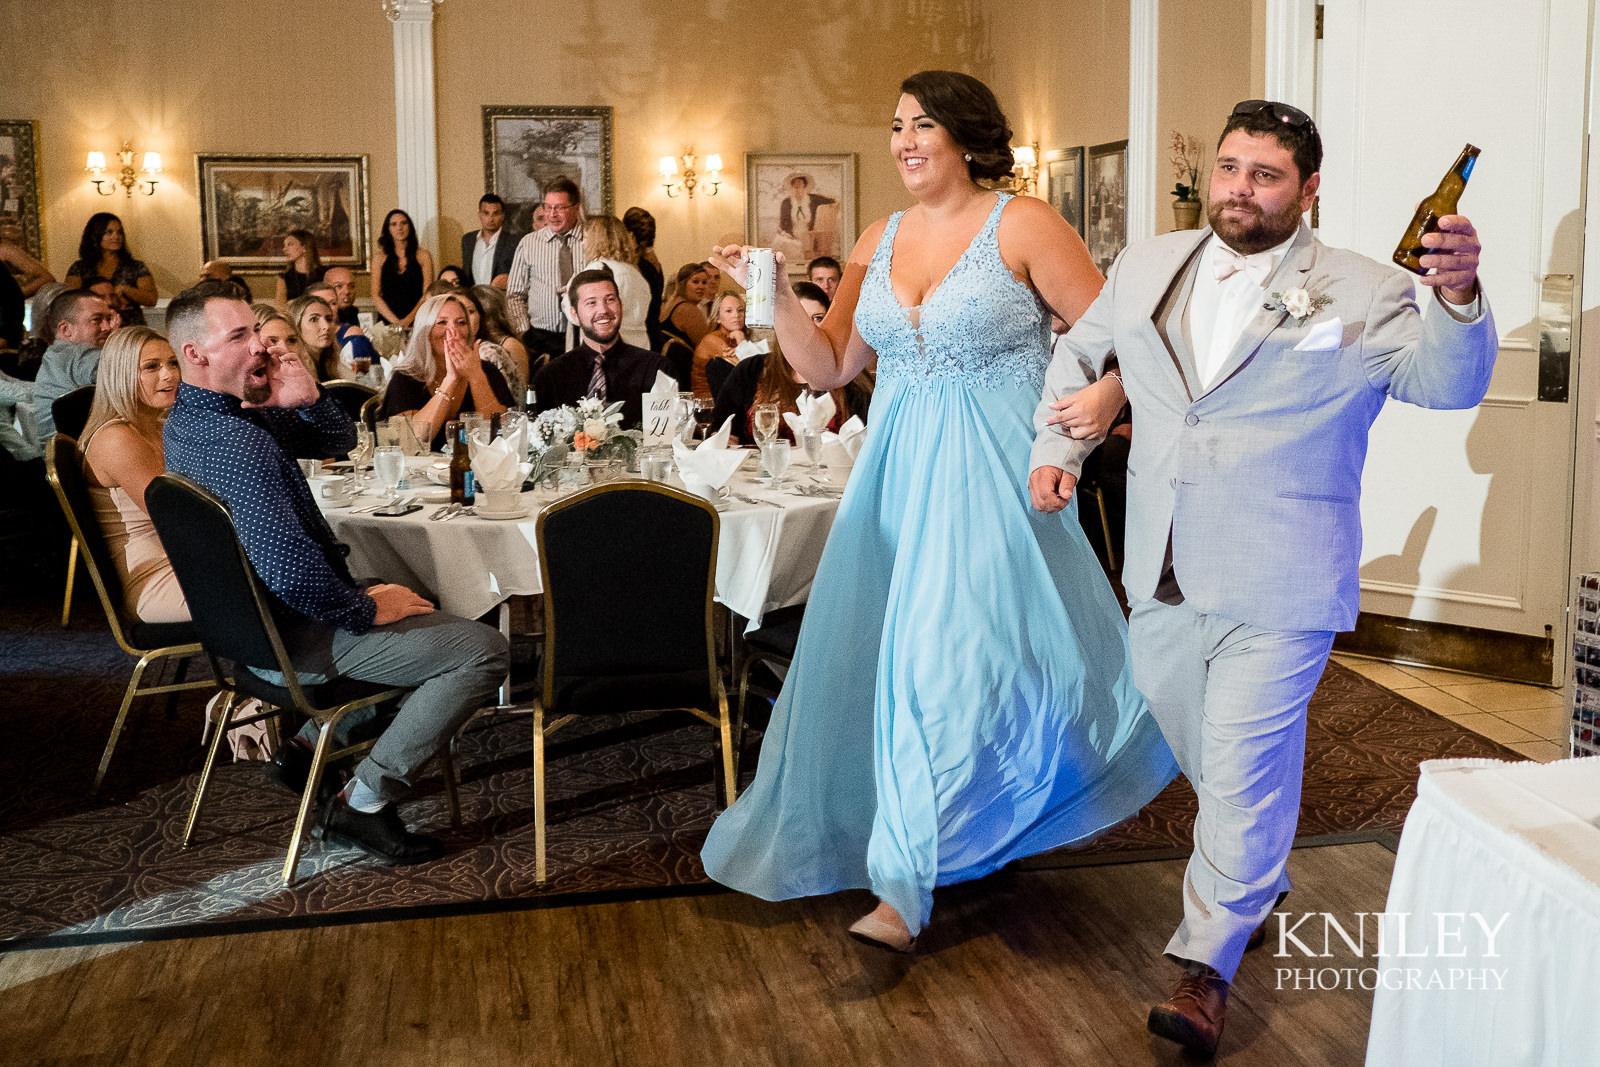 090 - Buffalo NY wedding pictures - Sean Patrick Restaurant Wedding Reception - Getzville - XT2B9308.jpg